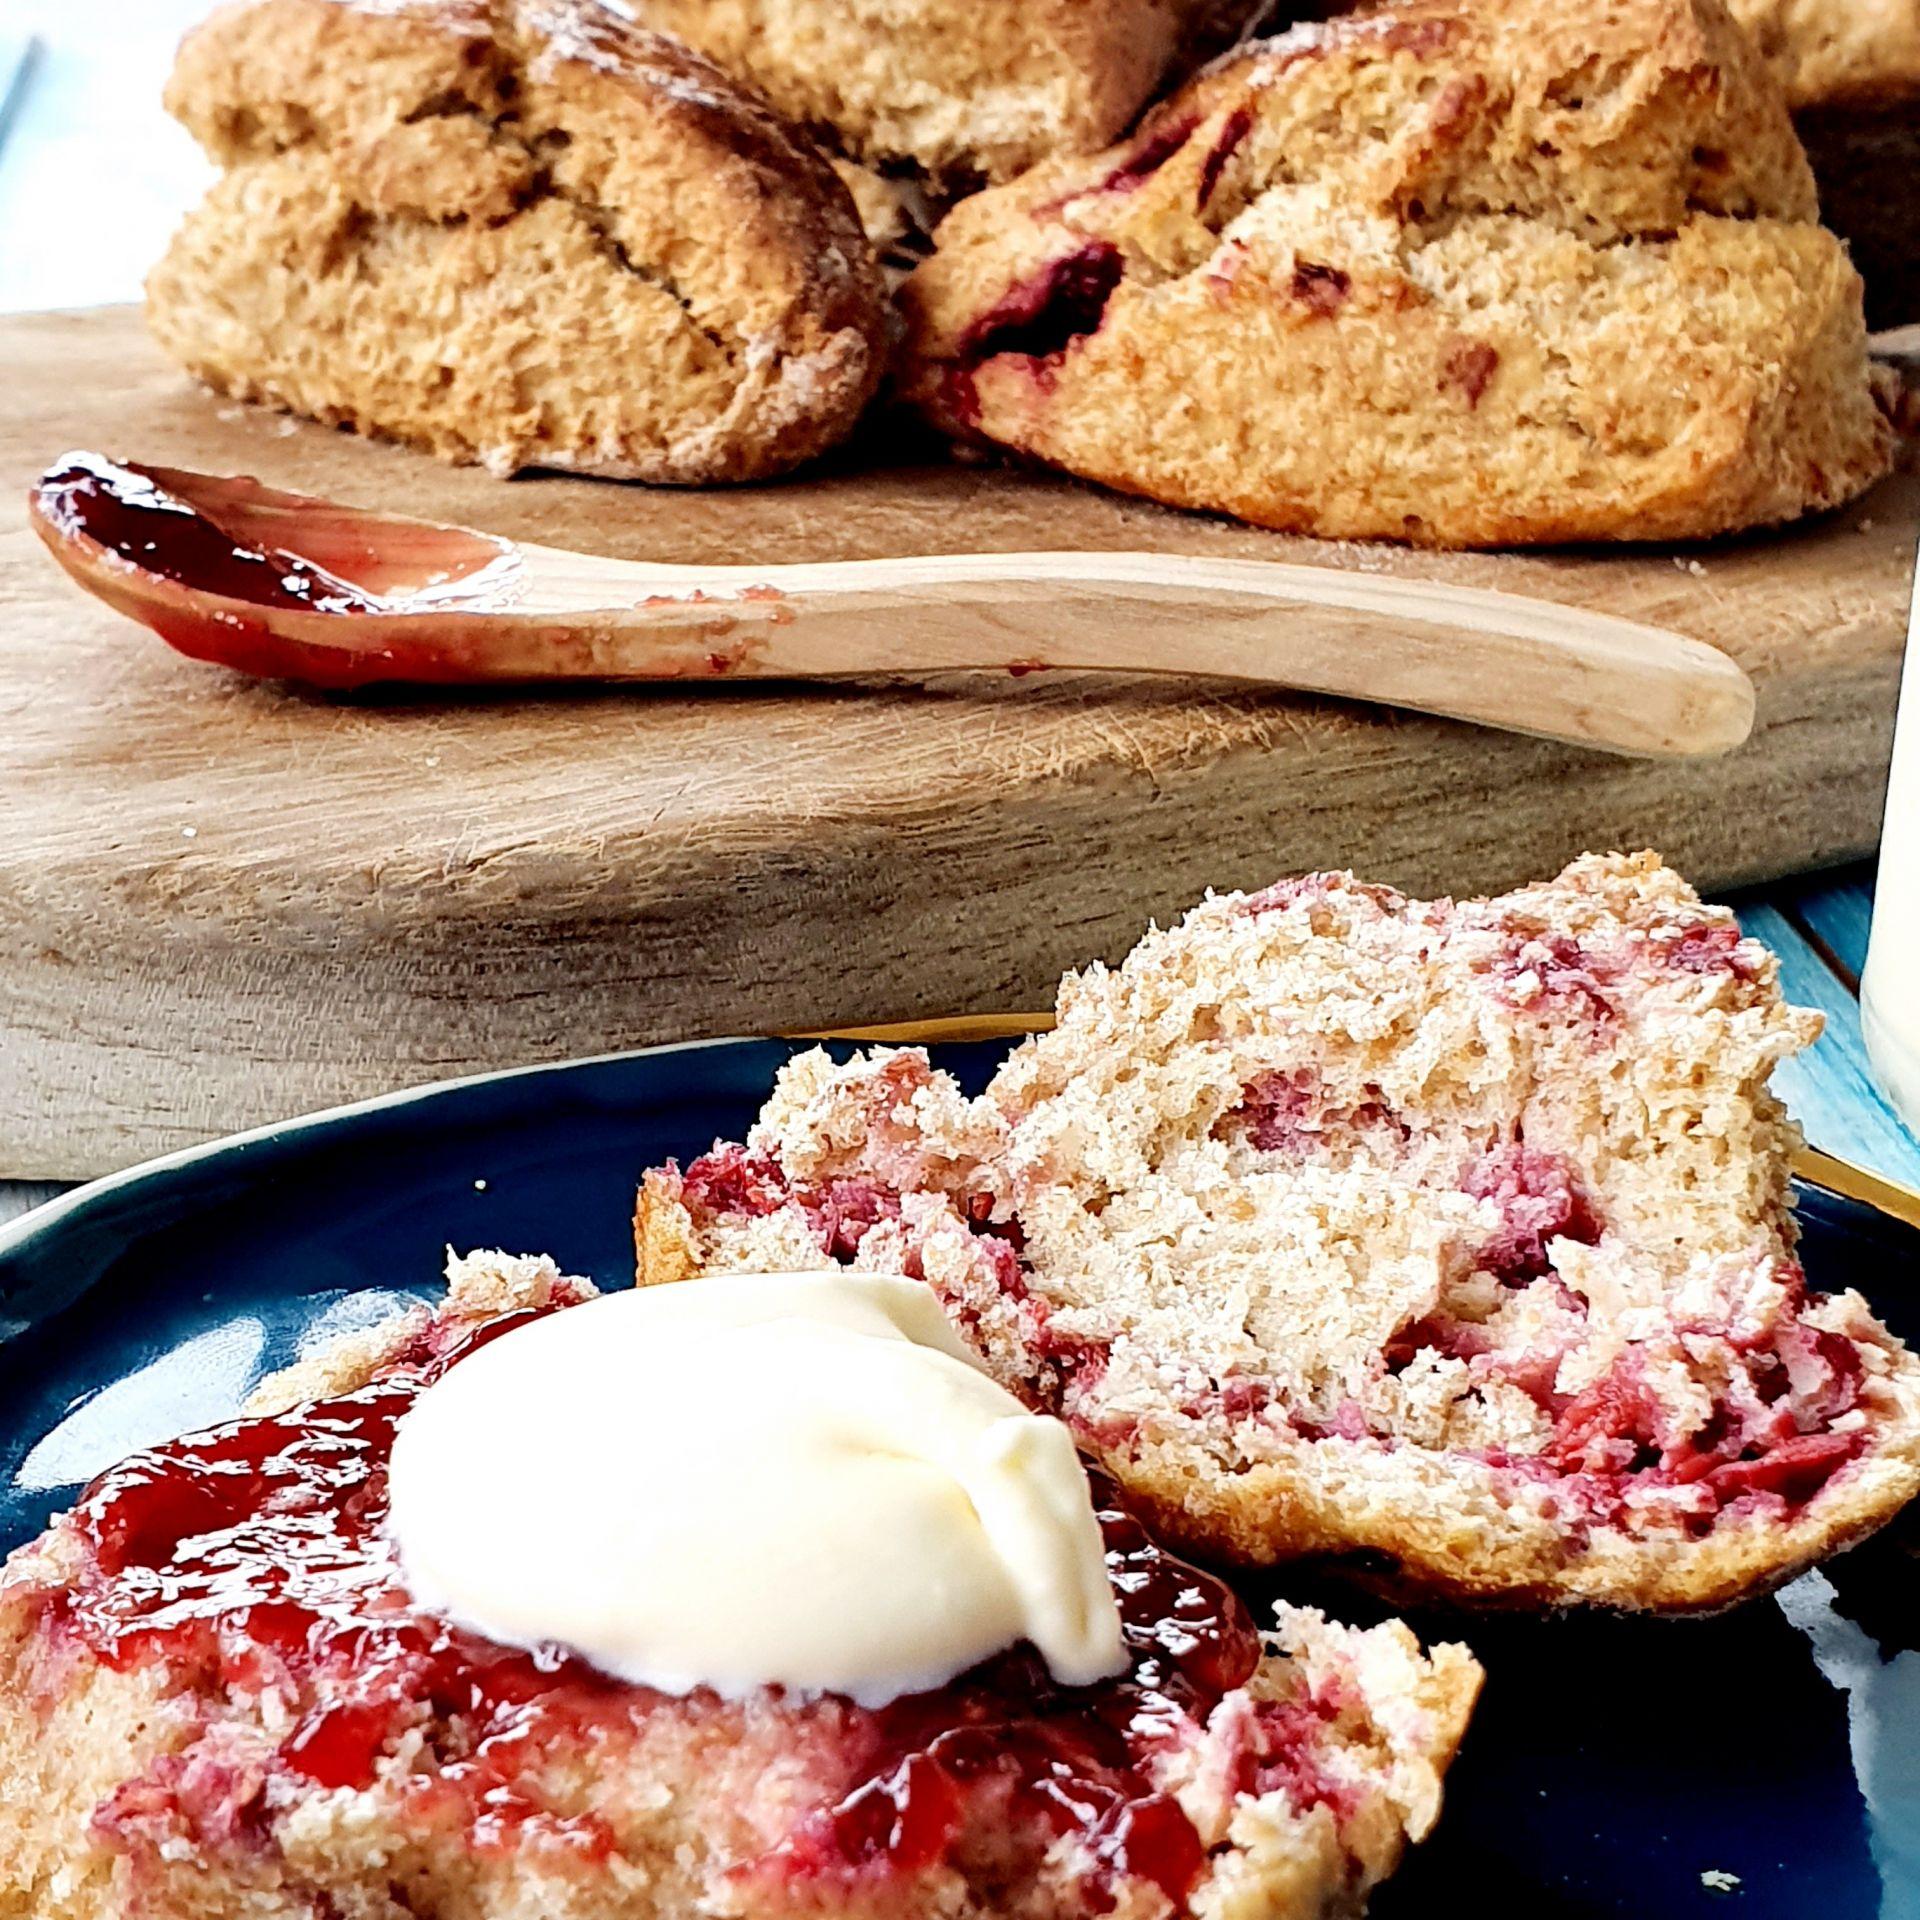 Scone with fresh jam and cream